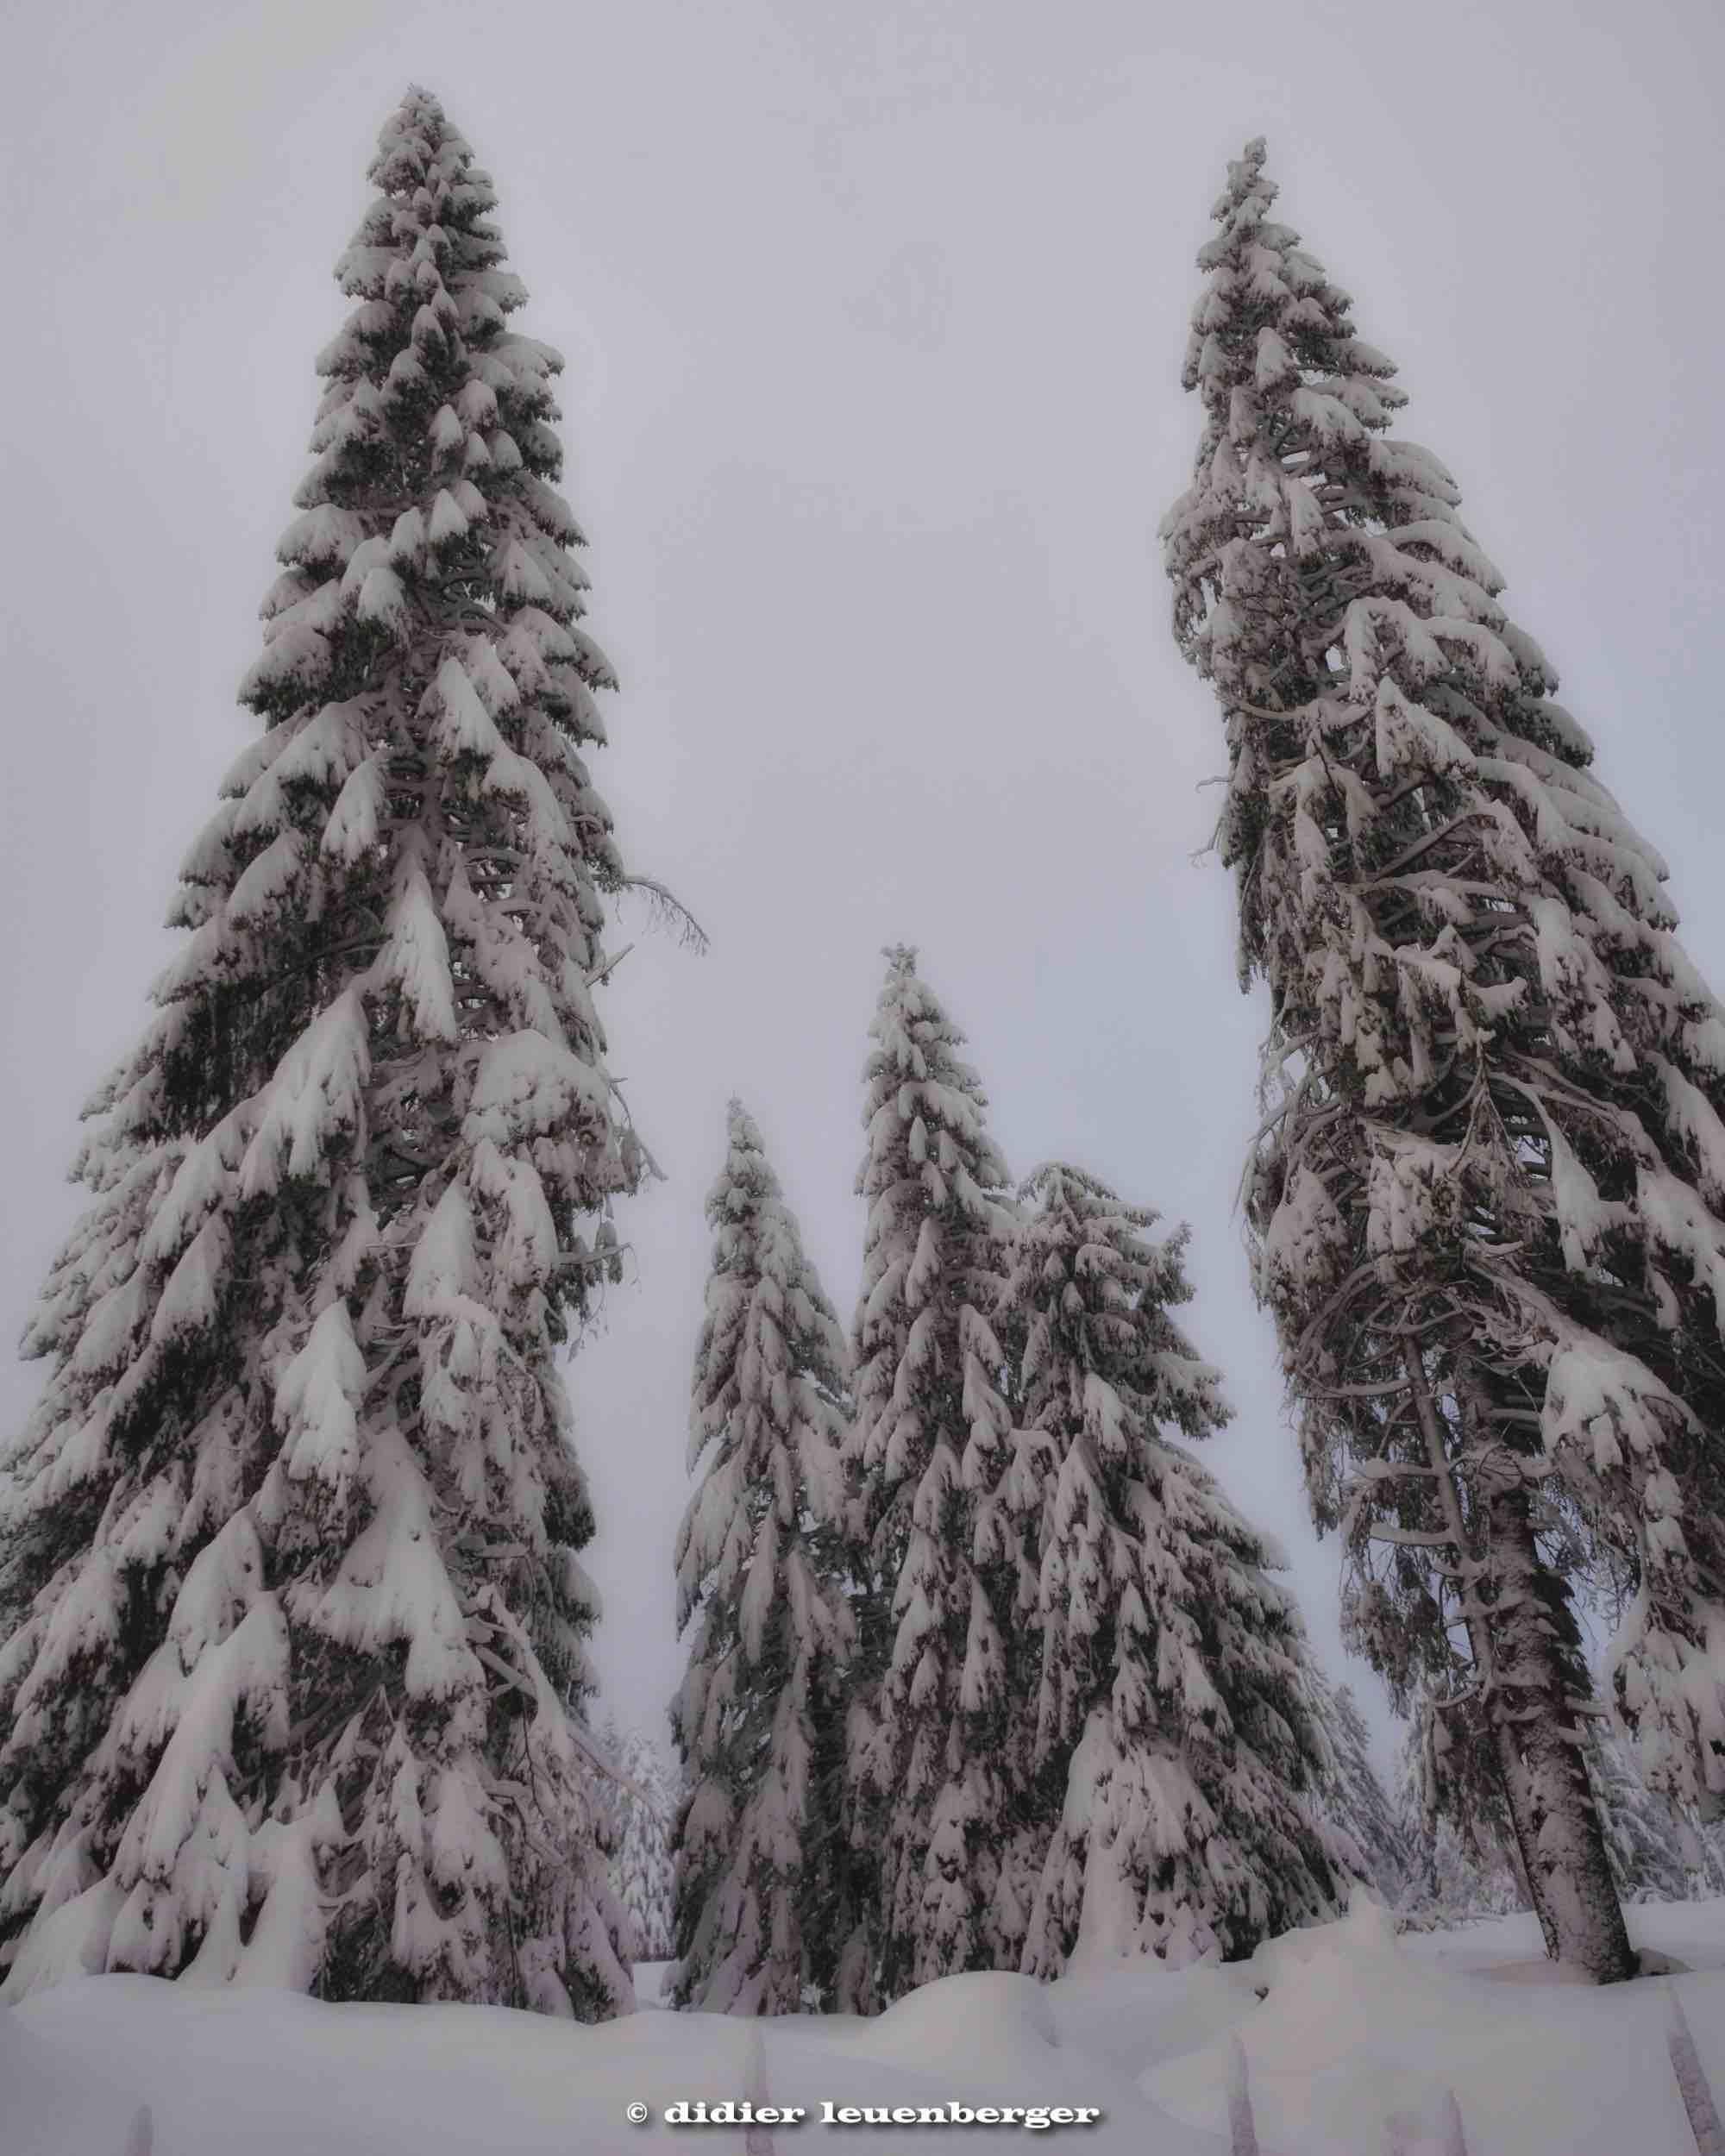 SUISSE PACCOTS PHOTO N7100 12 DECEMBRE 2017 218_HDR2.jpg